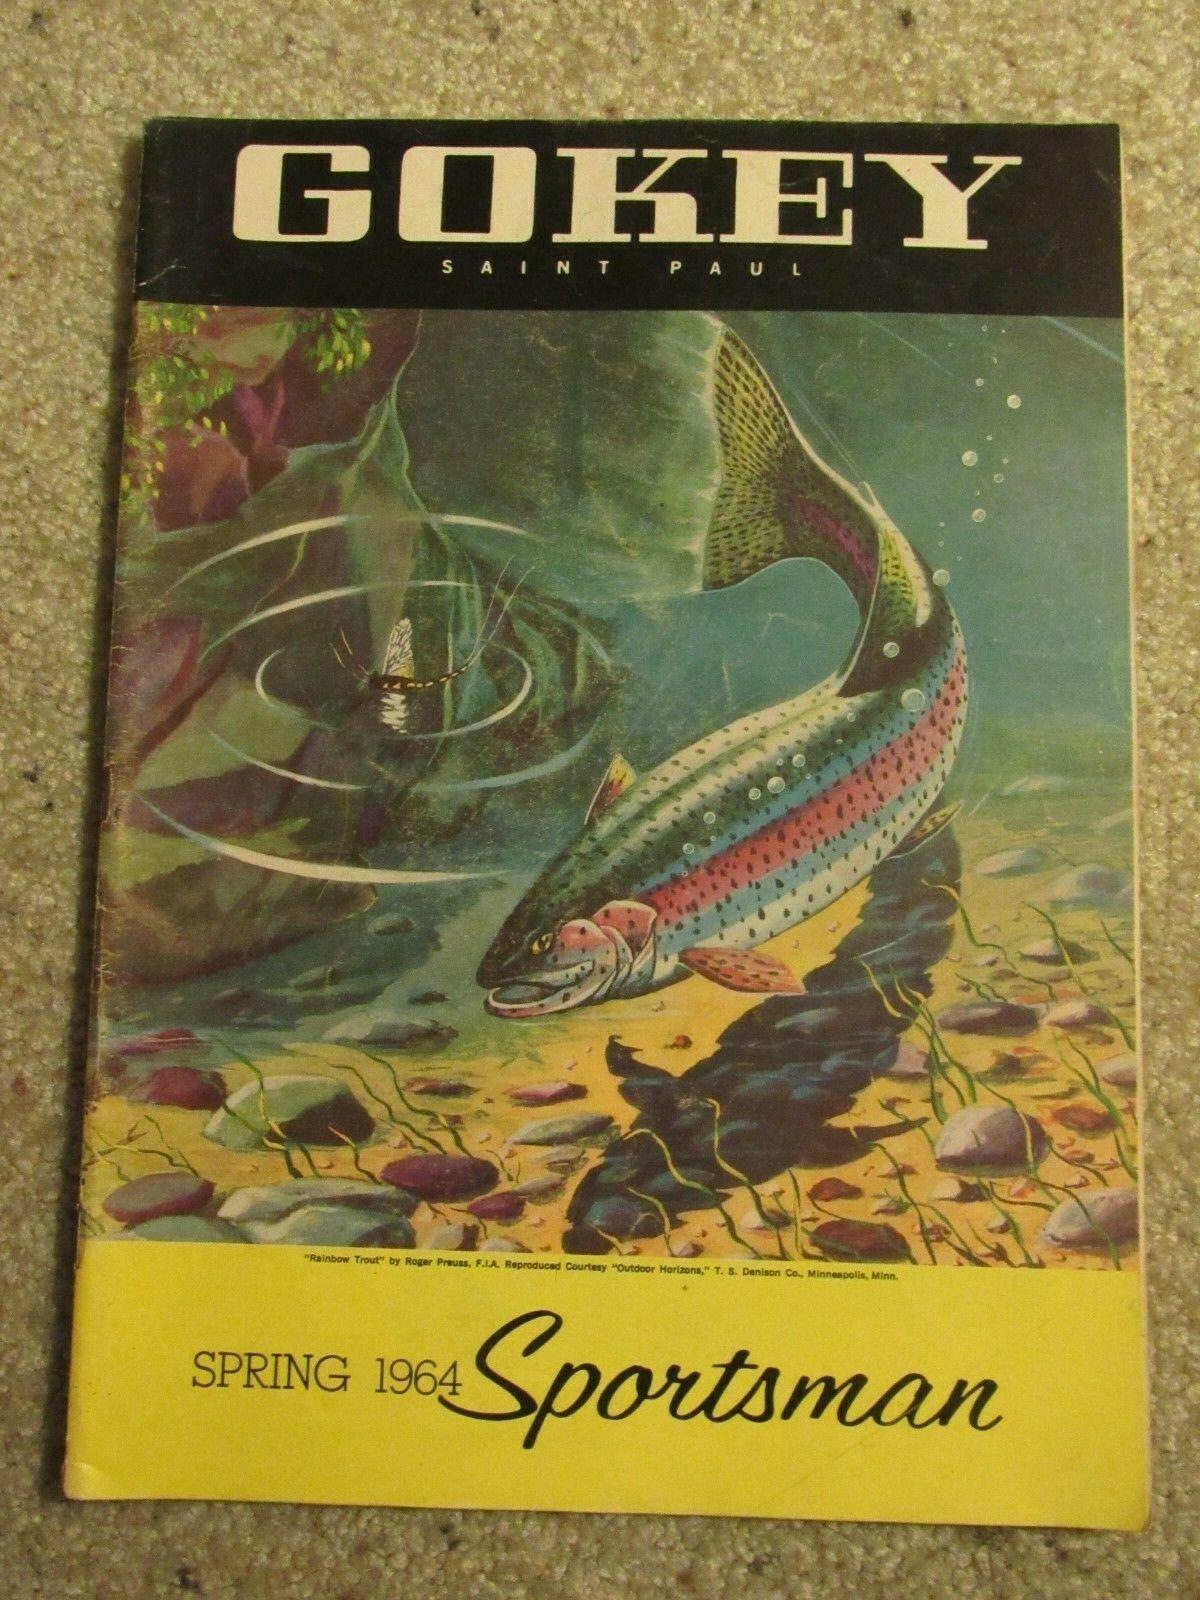 1964 GOKEY Spring Sportsman Catalog, 68 Pages - $4.99